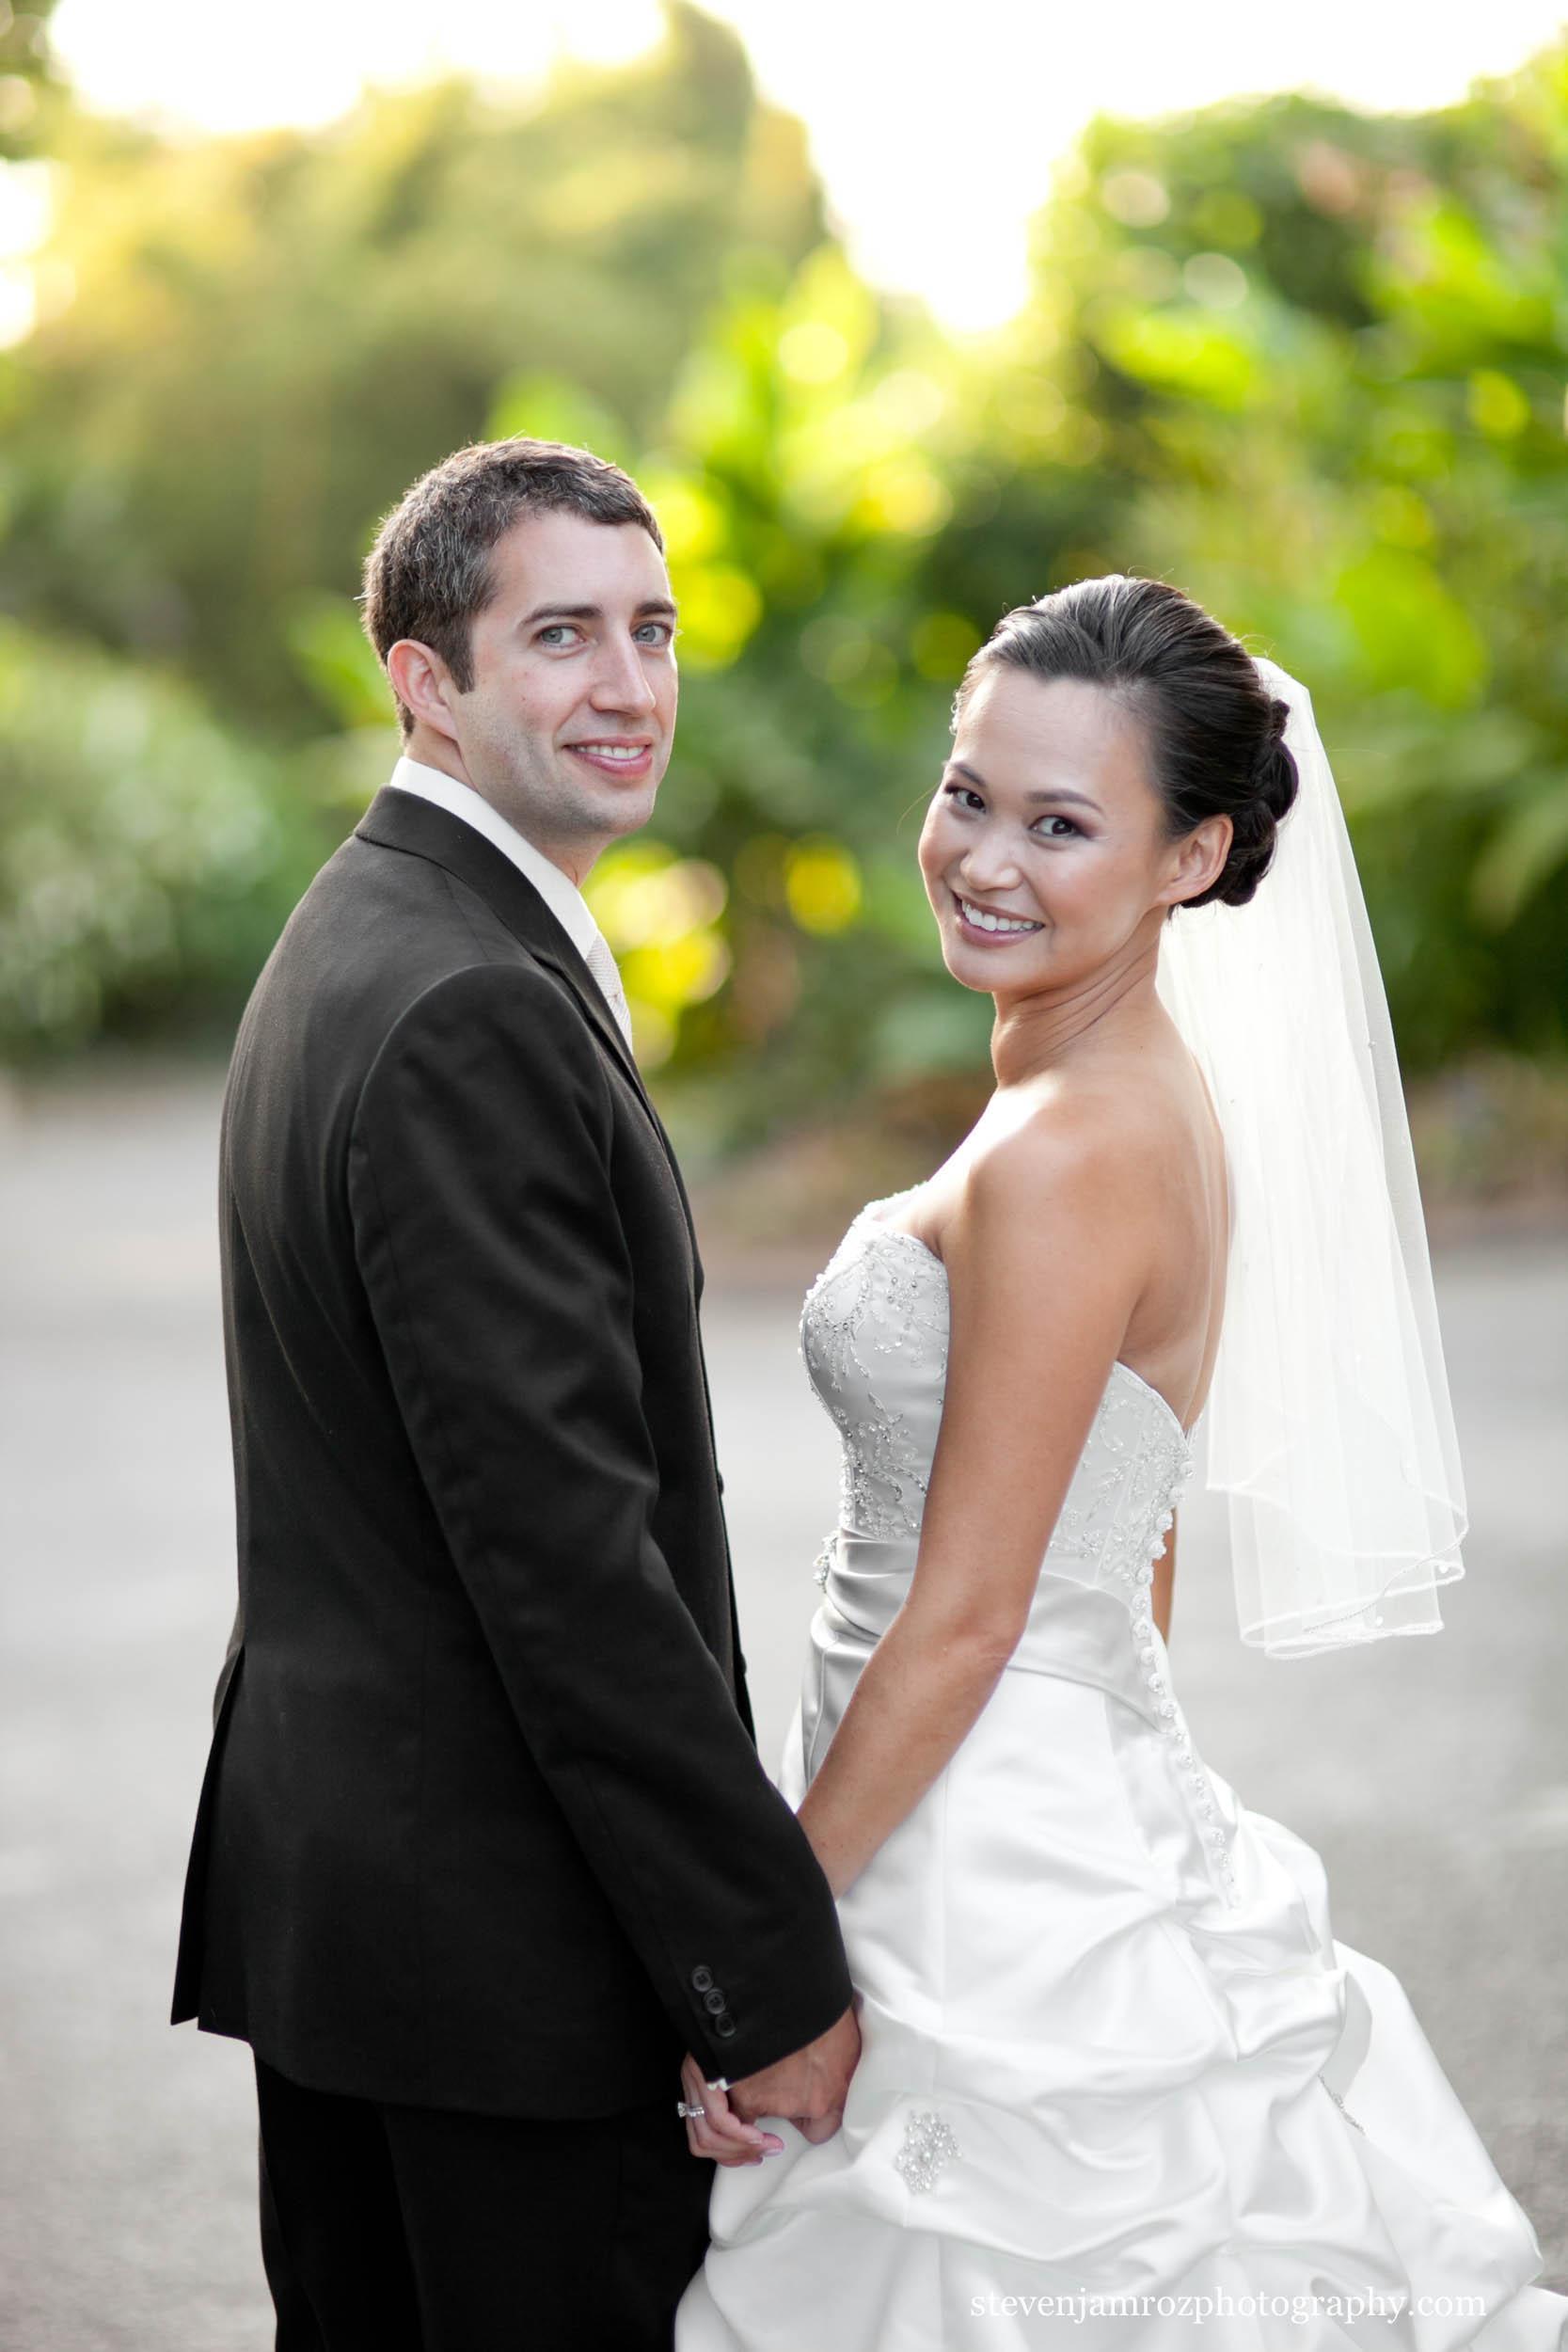 after-the-ceremony-wedding-couple-steven-jamroz-photography-0223.jpg